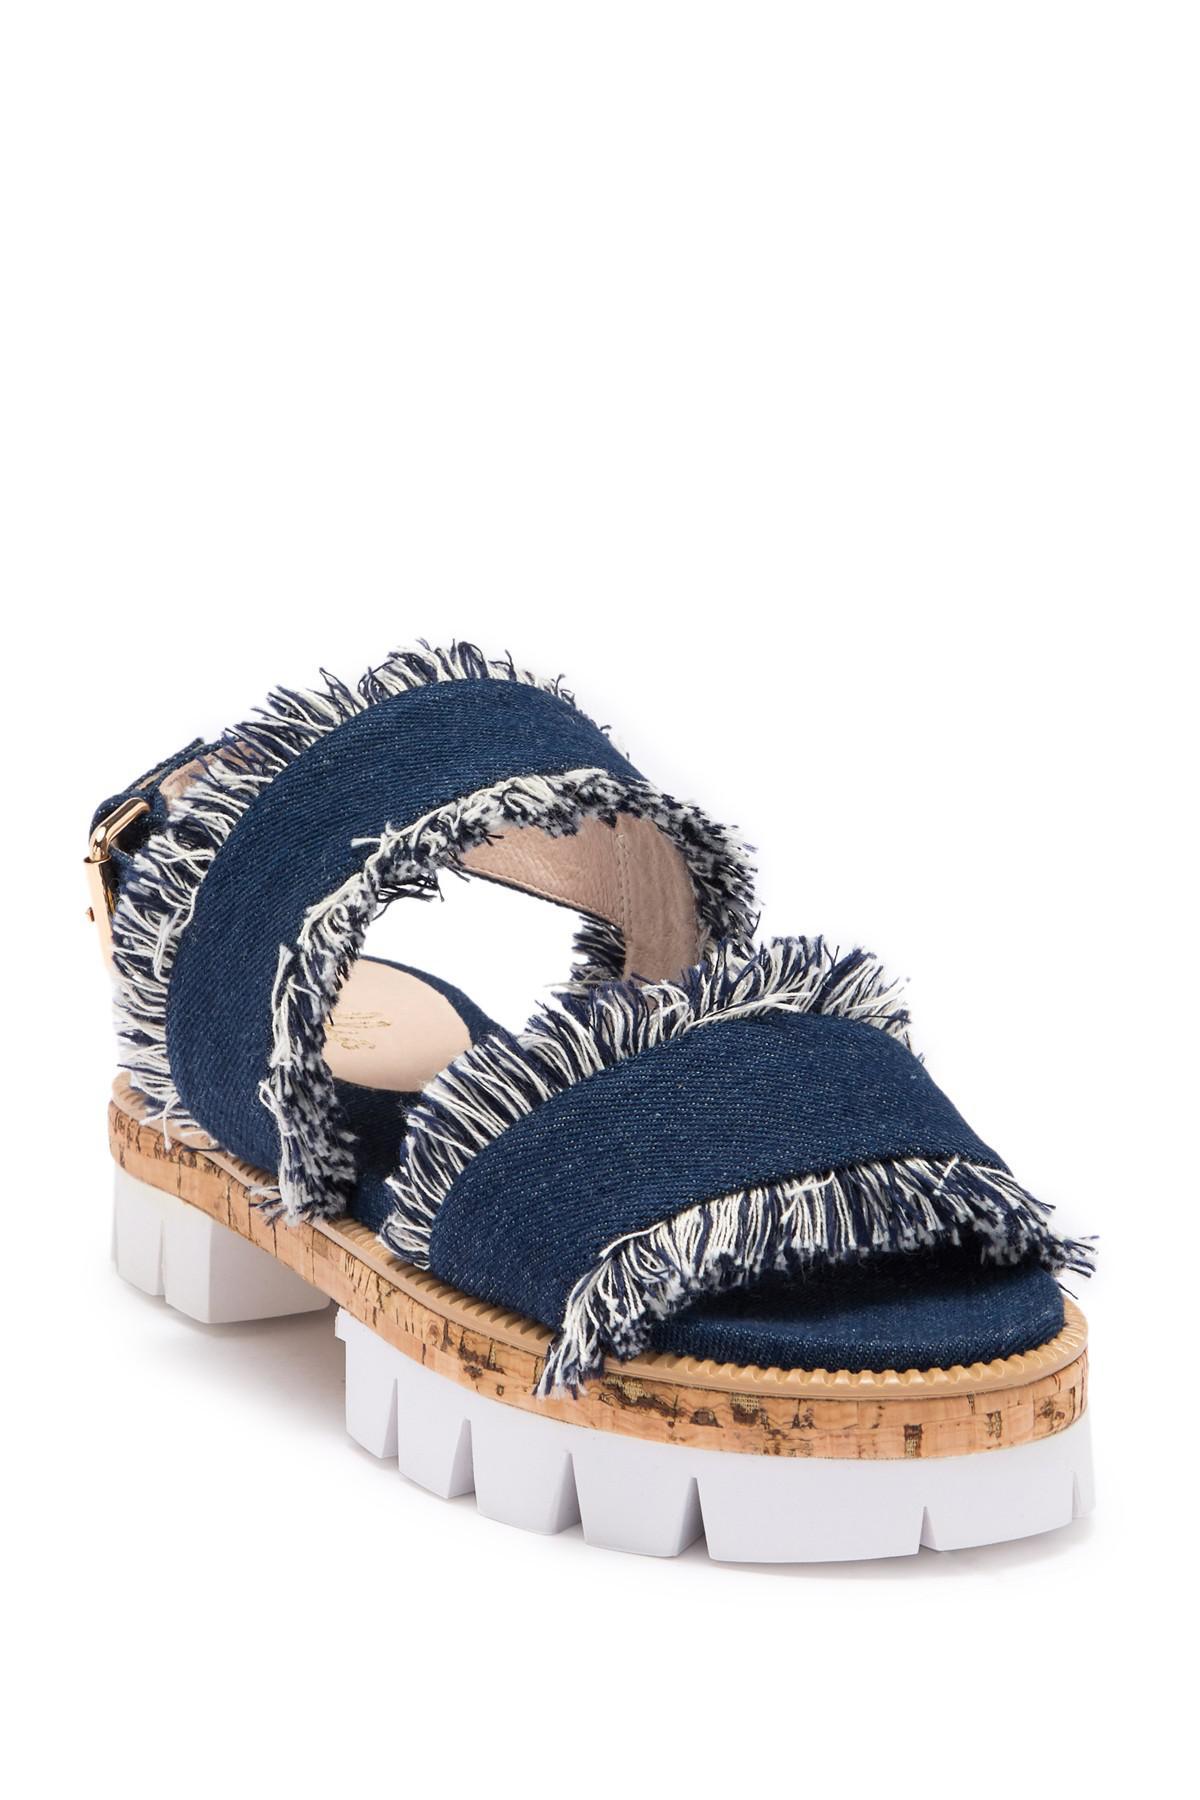 Shellys London Dembe Platform Sandal FnW2ZgrsbW